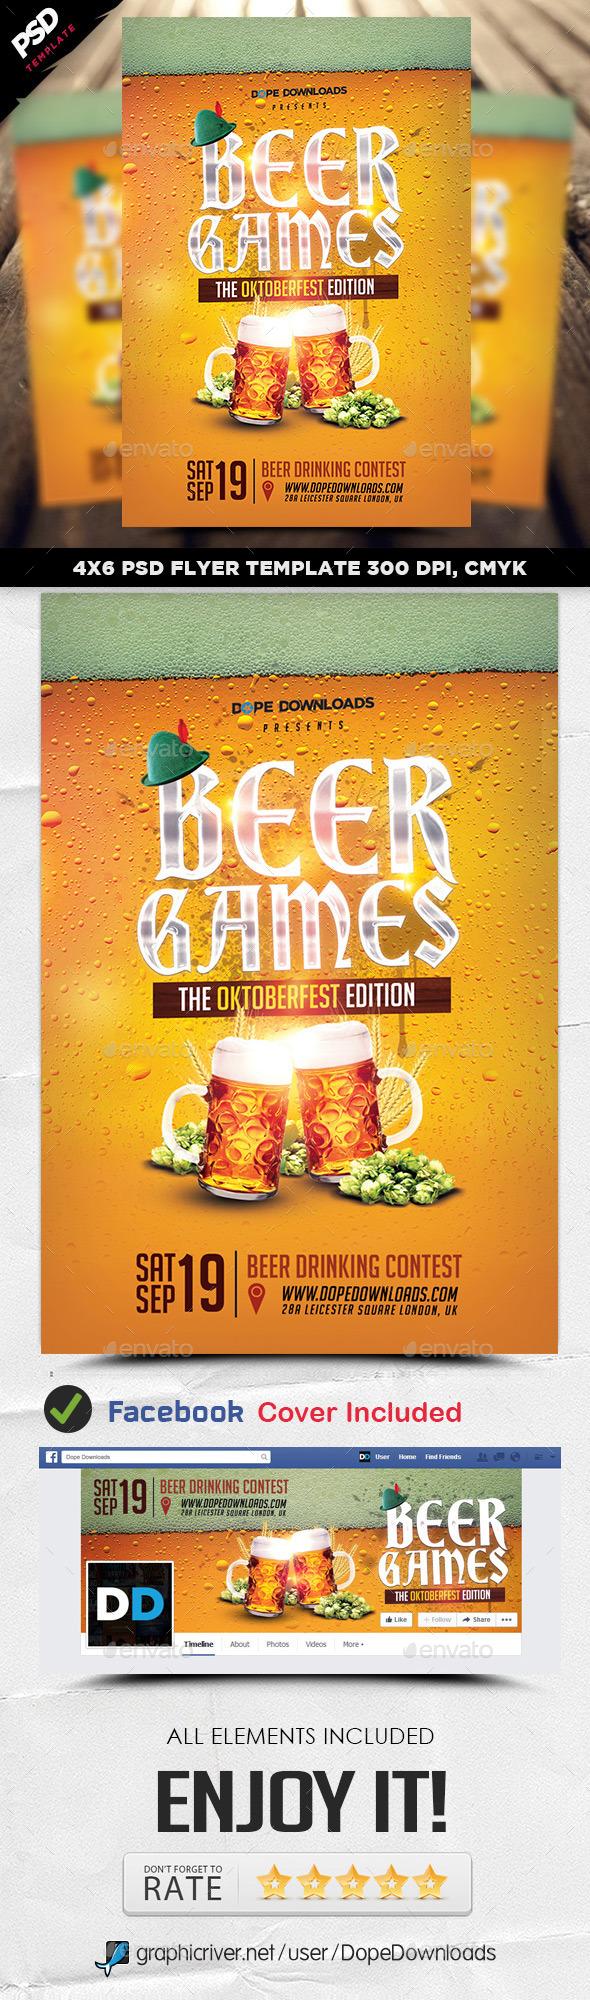 Beer Games Oktoberfest Edition Flyer - Events Flyers